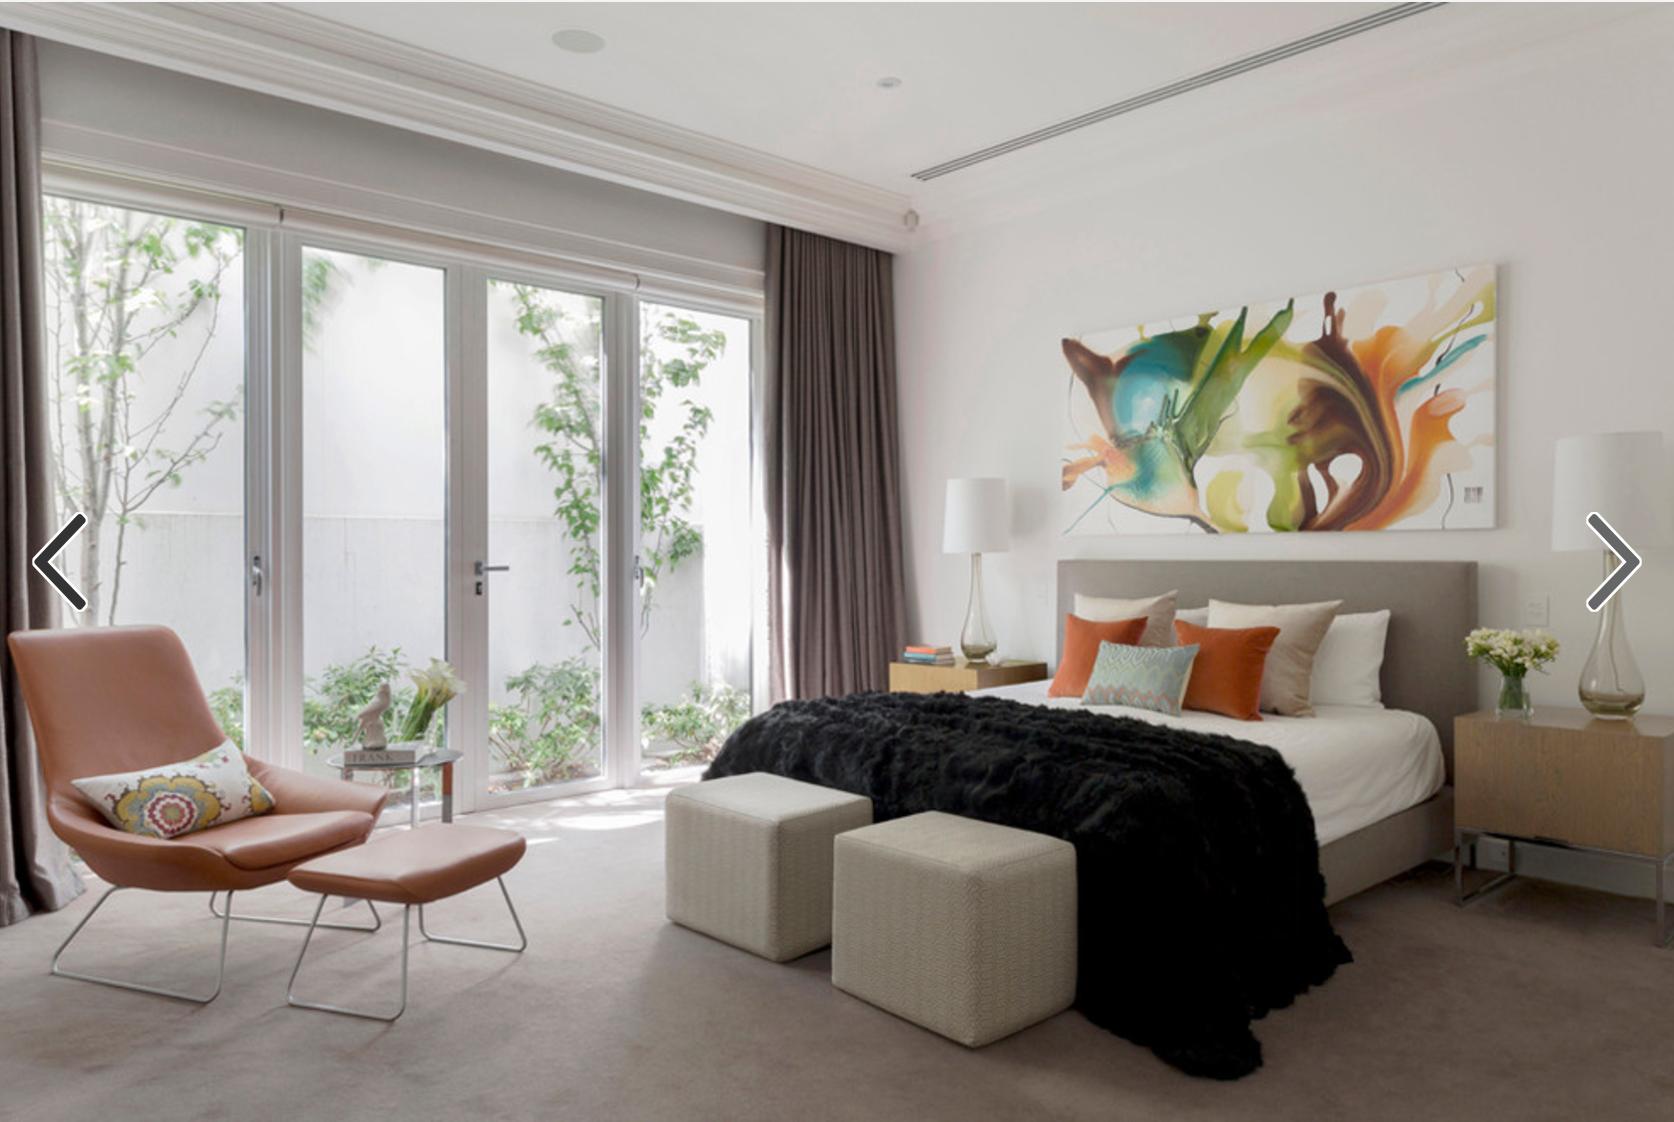 Pin by Kat Pisani on Room decor ahaha in 2020 Bedroom